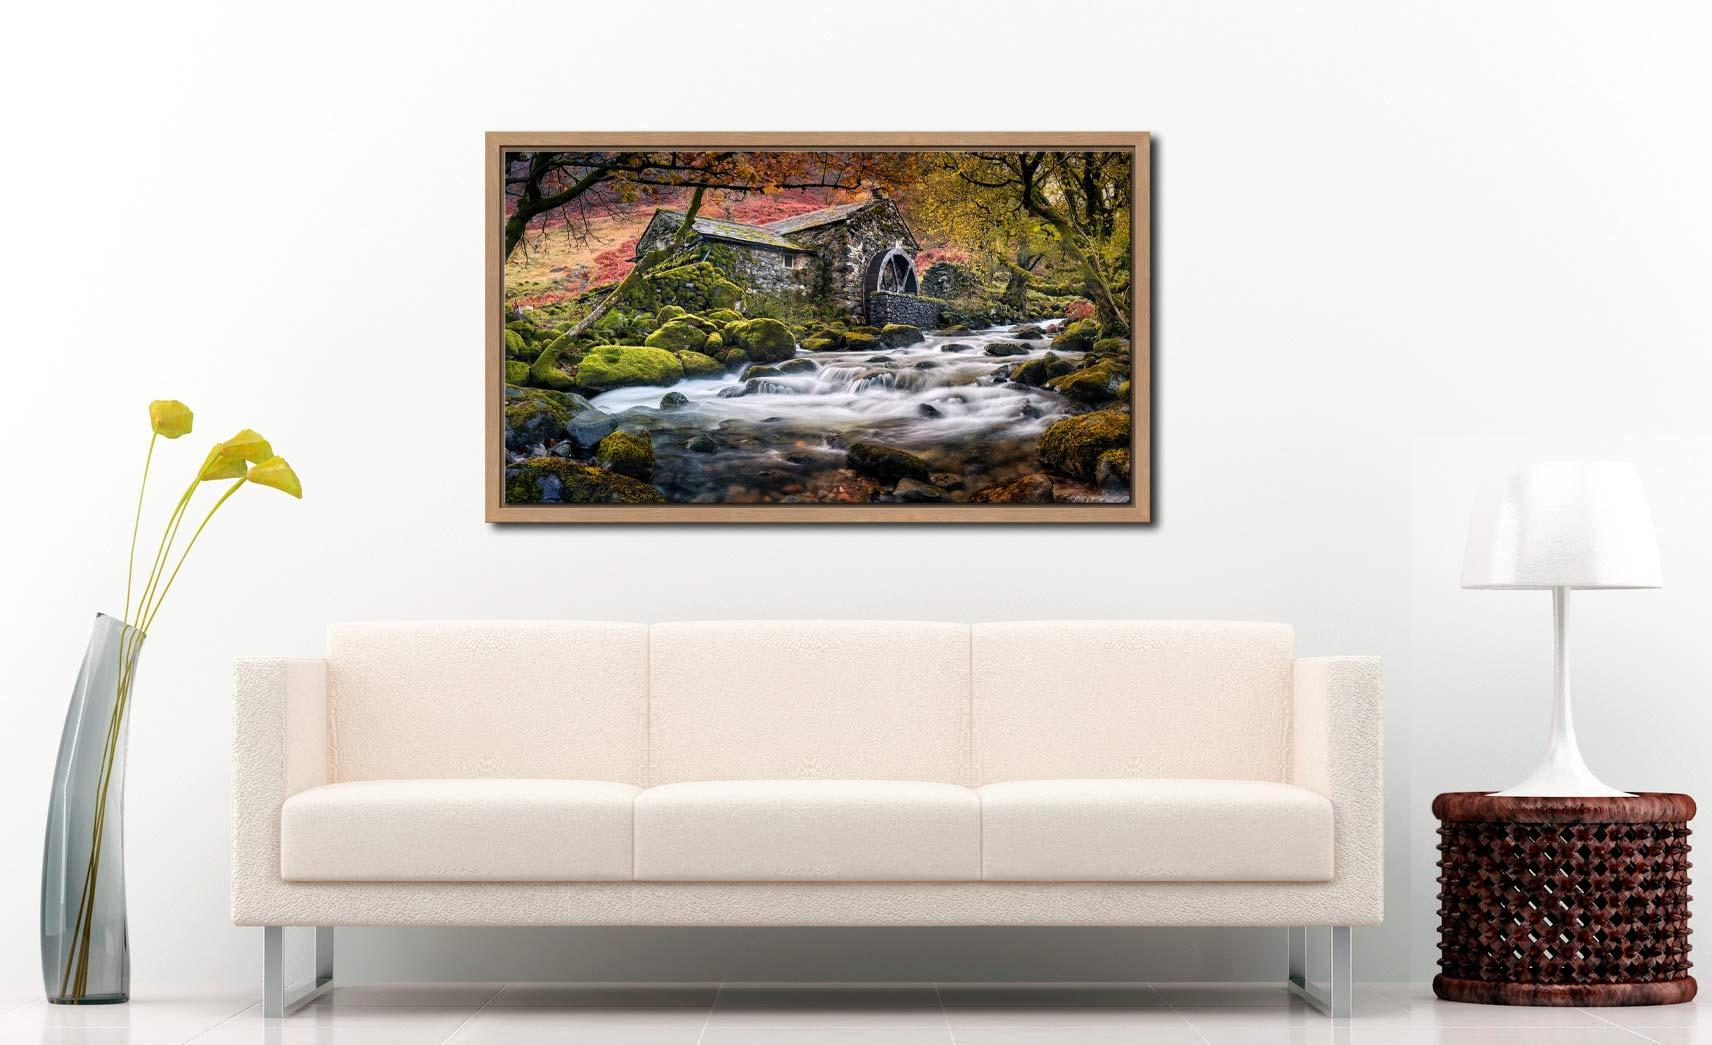 Borrowdale Mill - Oak floater frame with acrylic glazing on Wall